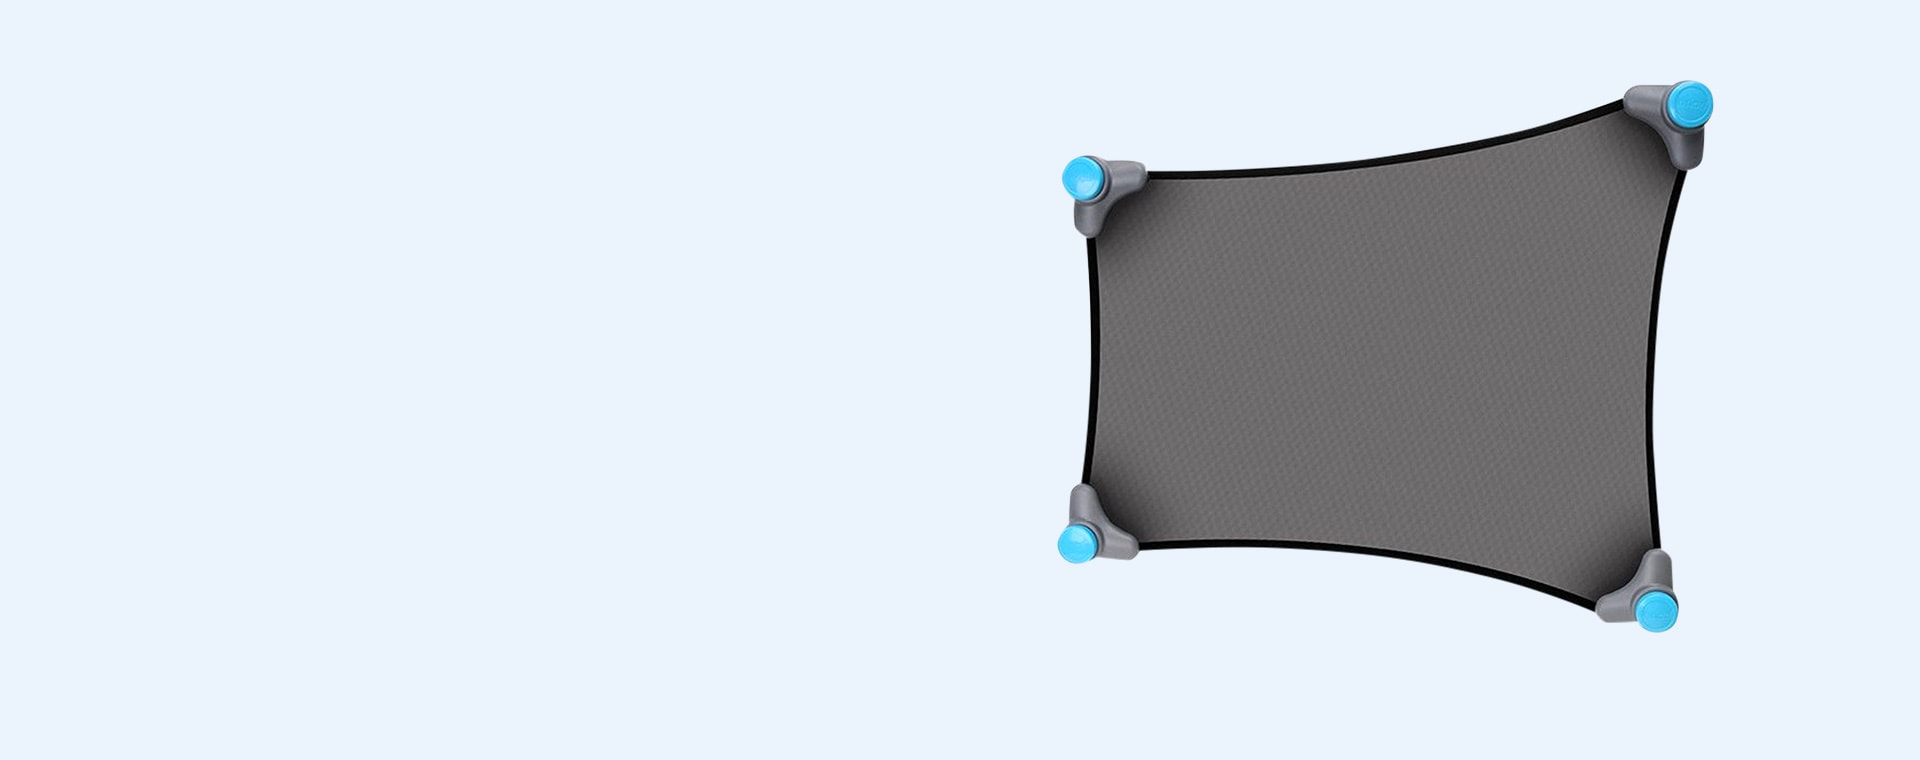 Black Munchkin Stretch To Fit Sunshade